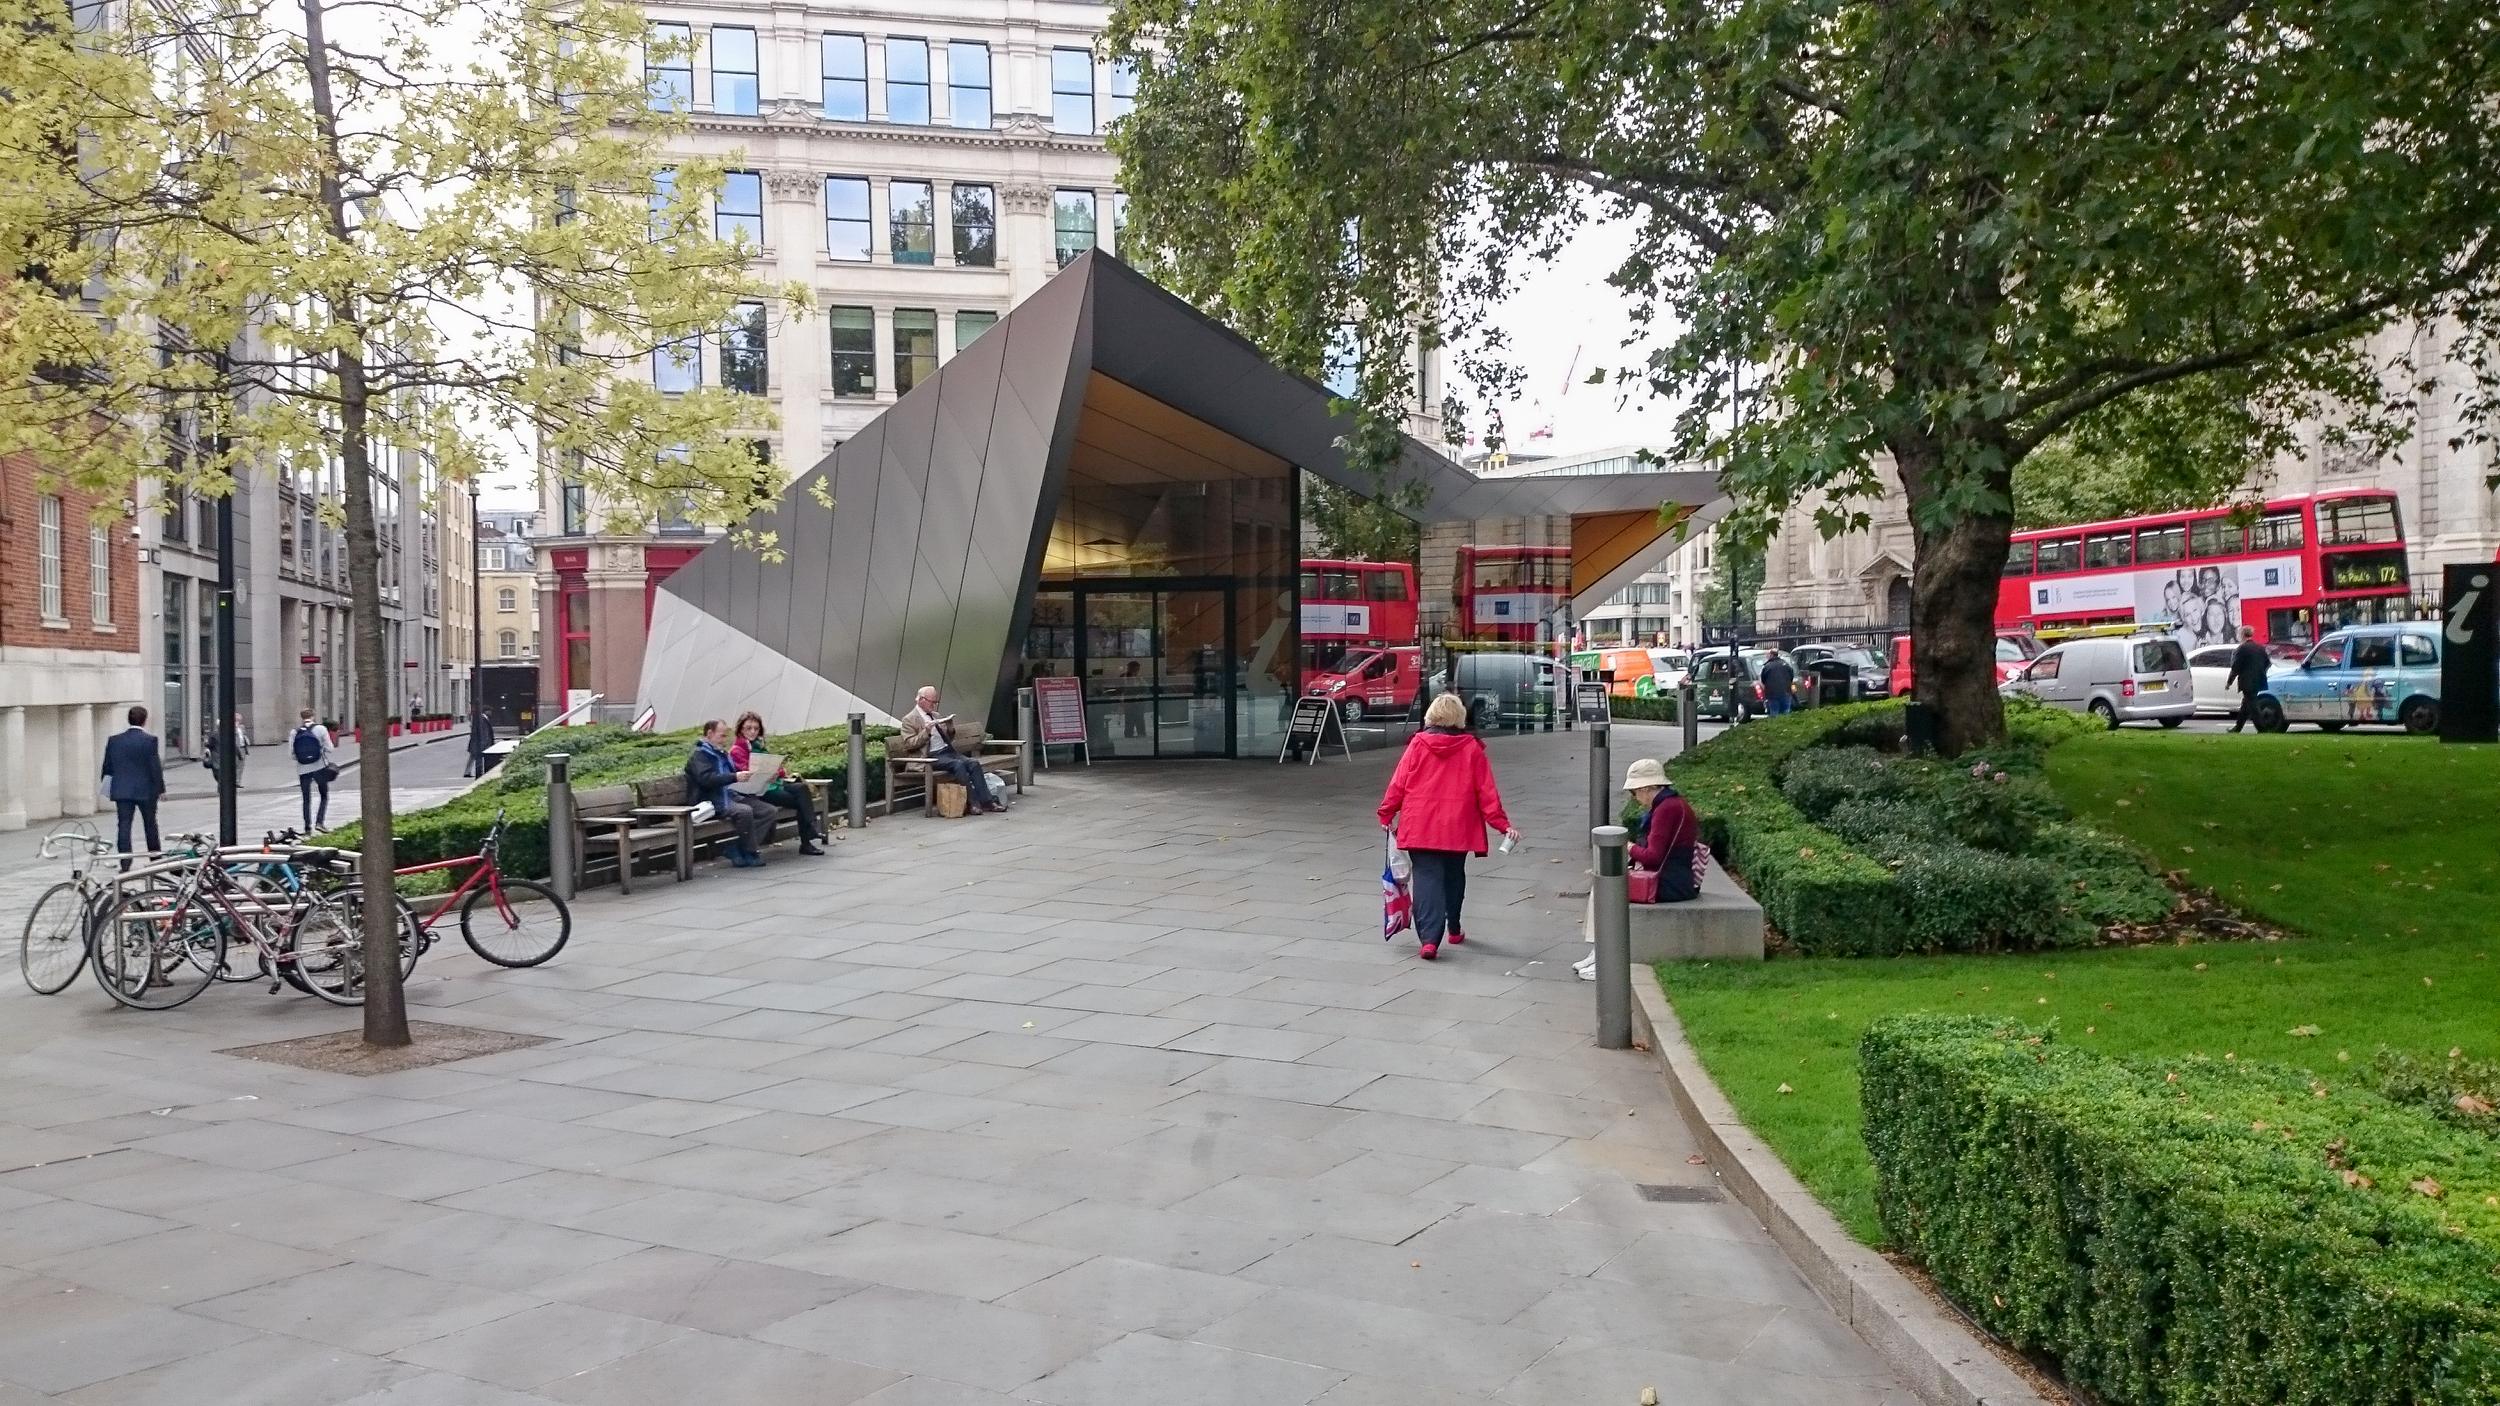 St Pauls information Kiosk - Make Architects